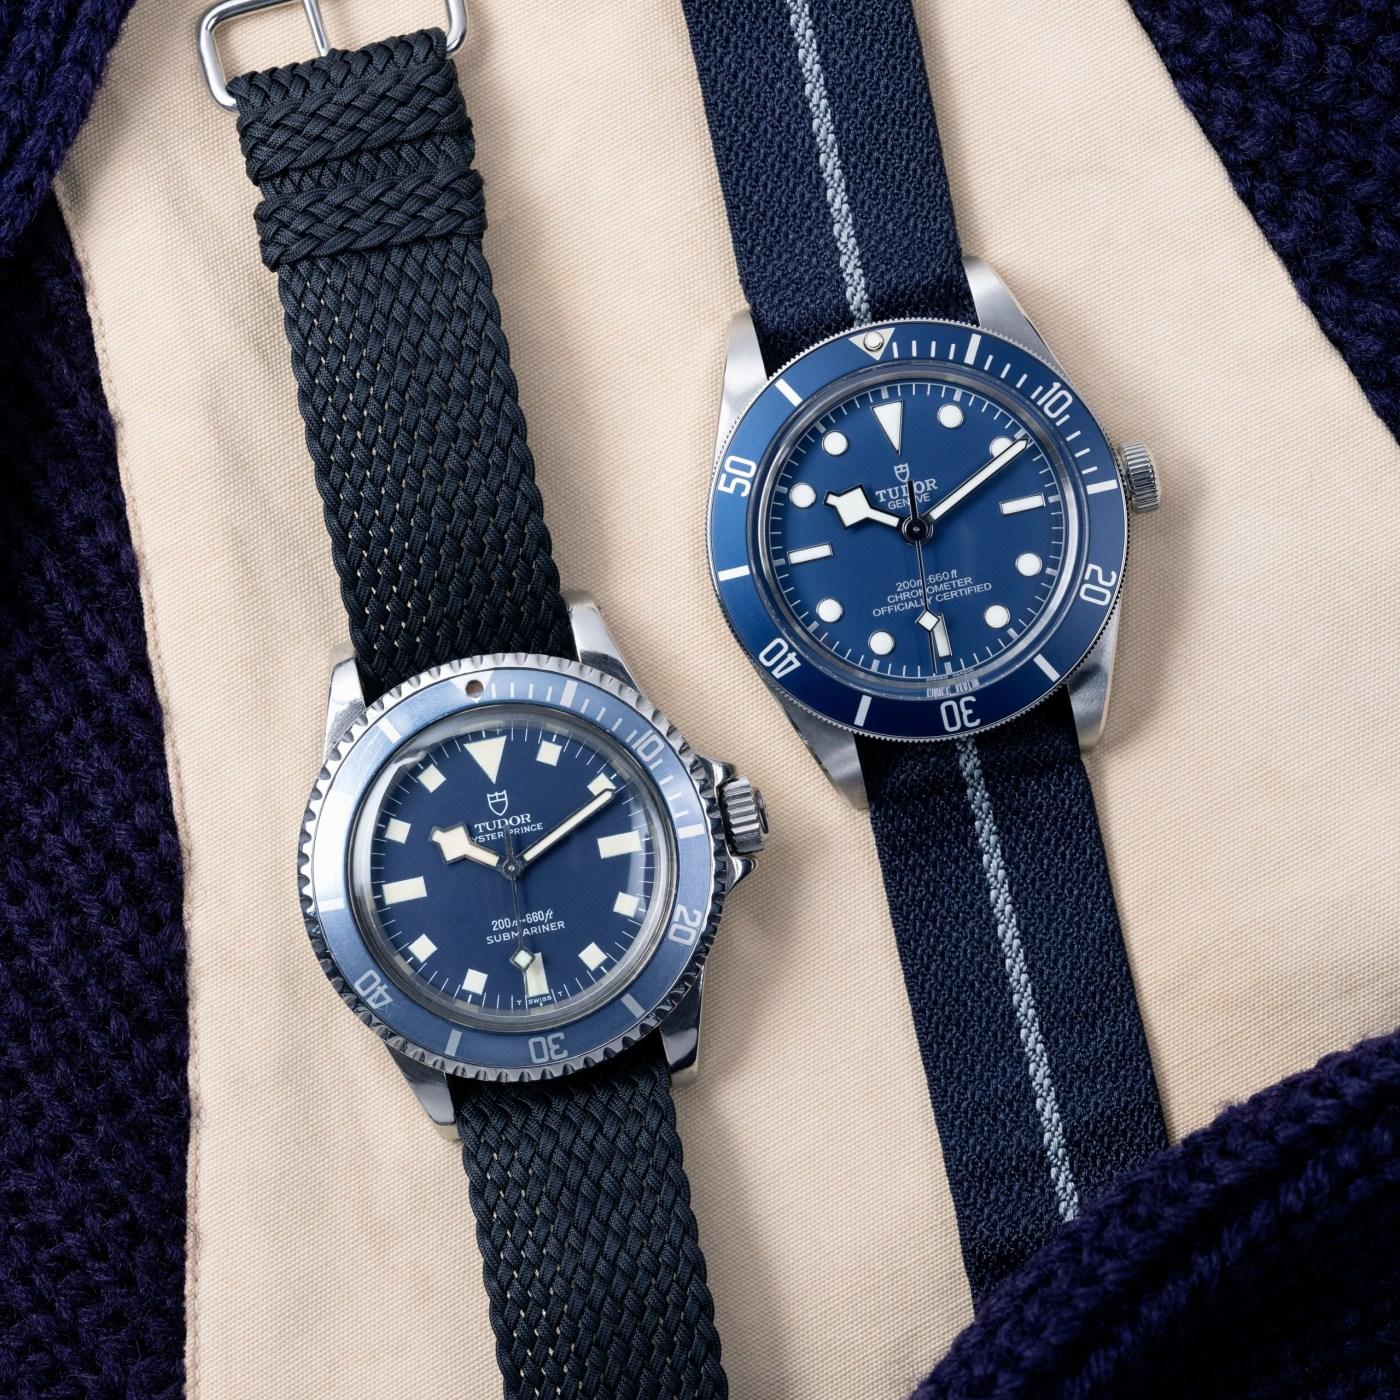 Tudor Black Bay Fifty-Eight Navy Blue next to Submariner Marine Nationale